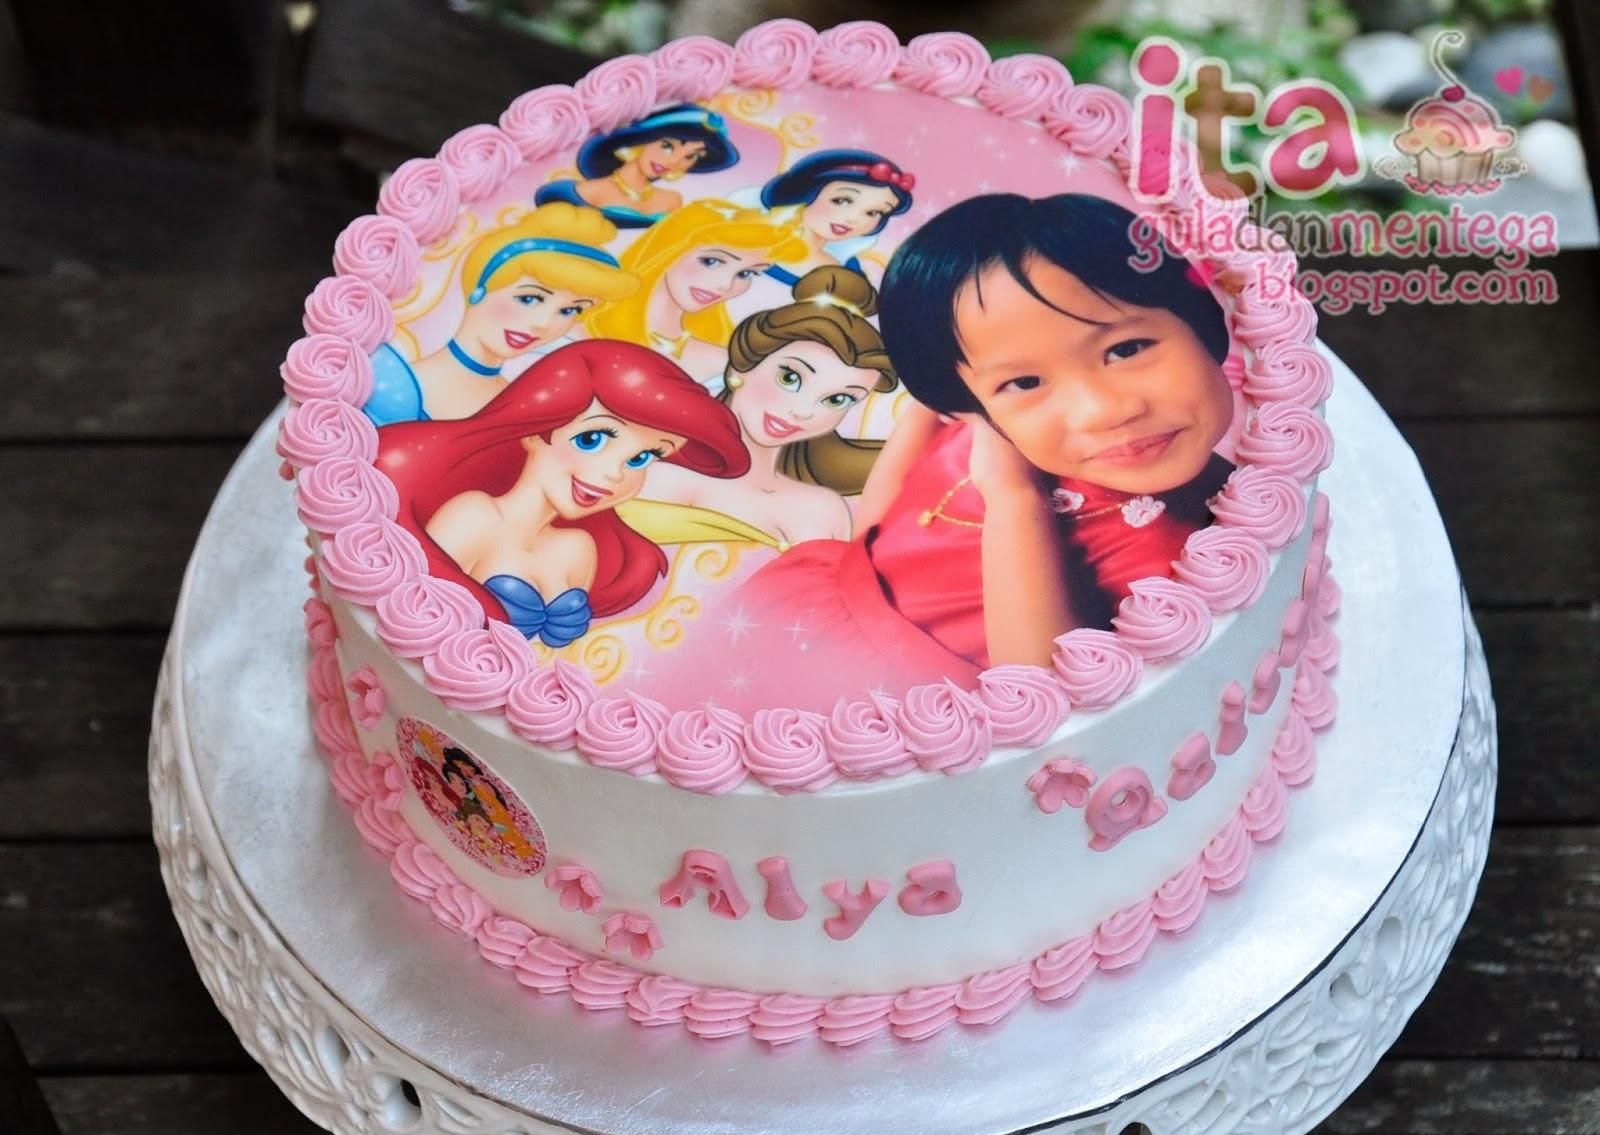 Gula Dan Mentega Birthday Cake